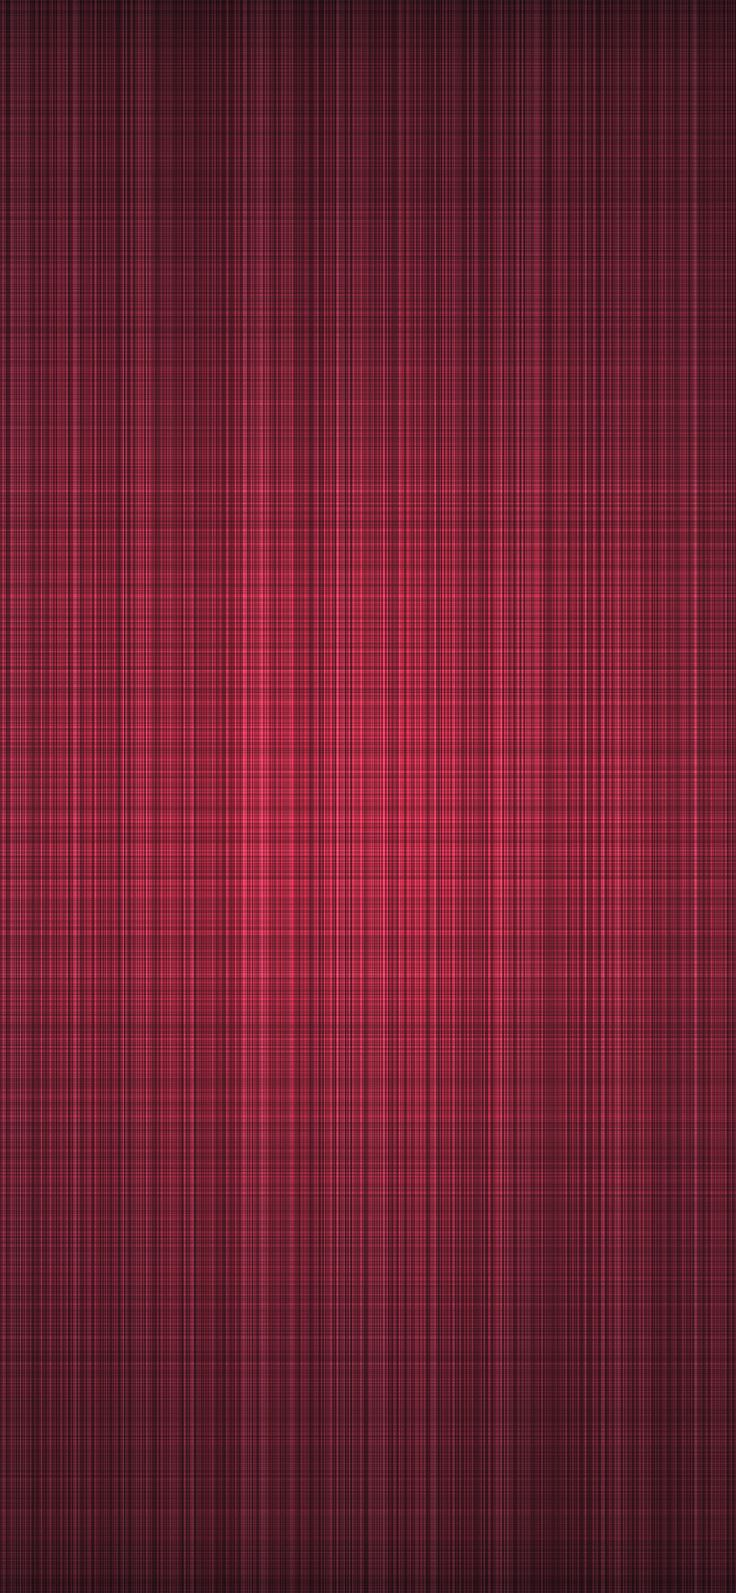 Iphone X Wallpaper Vr81 Linen Red Dark Abstract Pattern Via